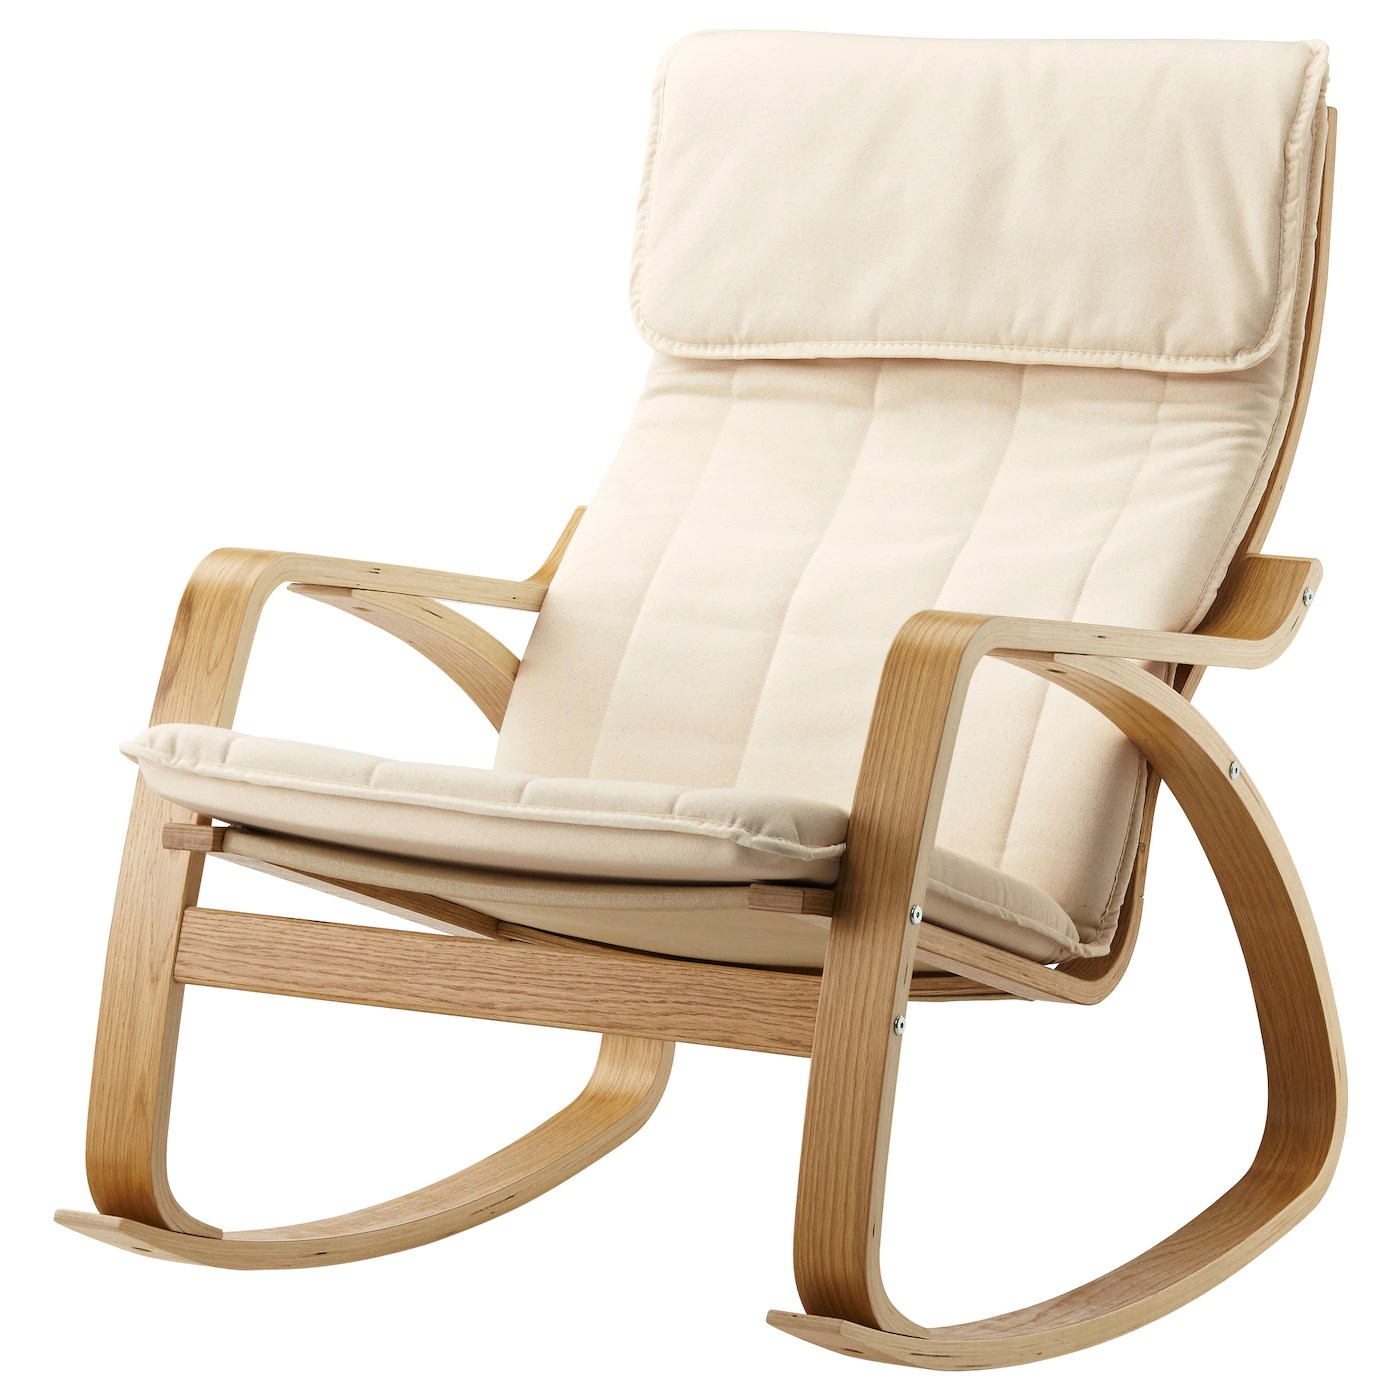 ikea rocking chairs spandex chair covers australia poÄng oak veneer ransta natural